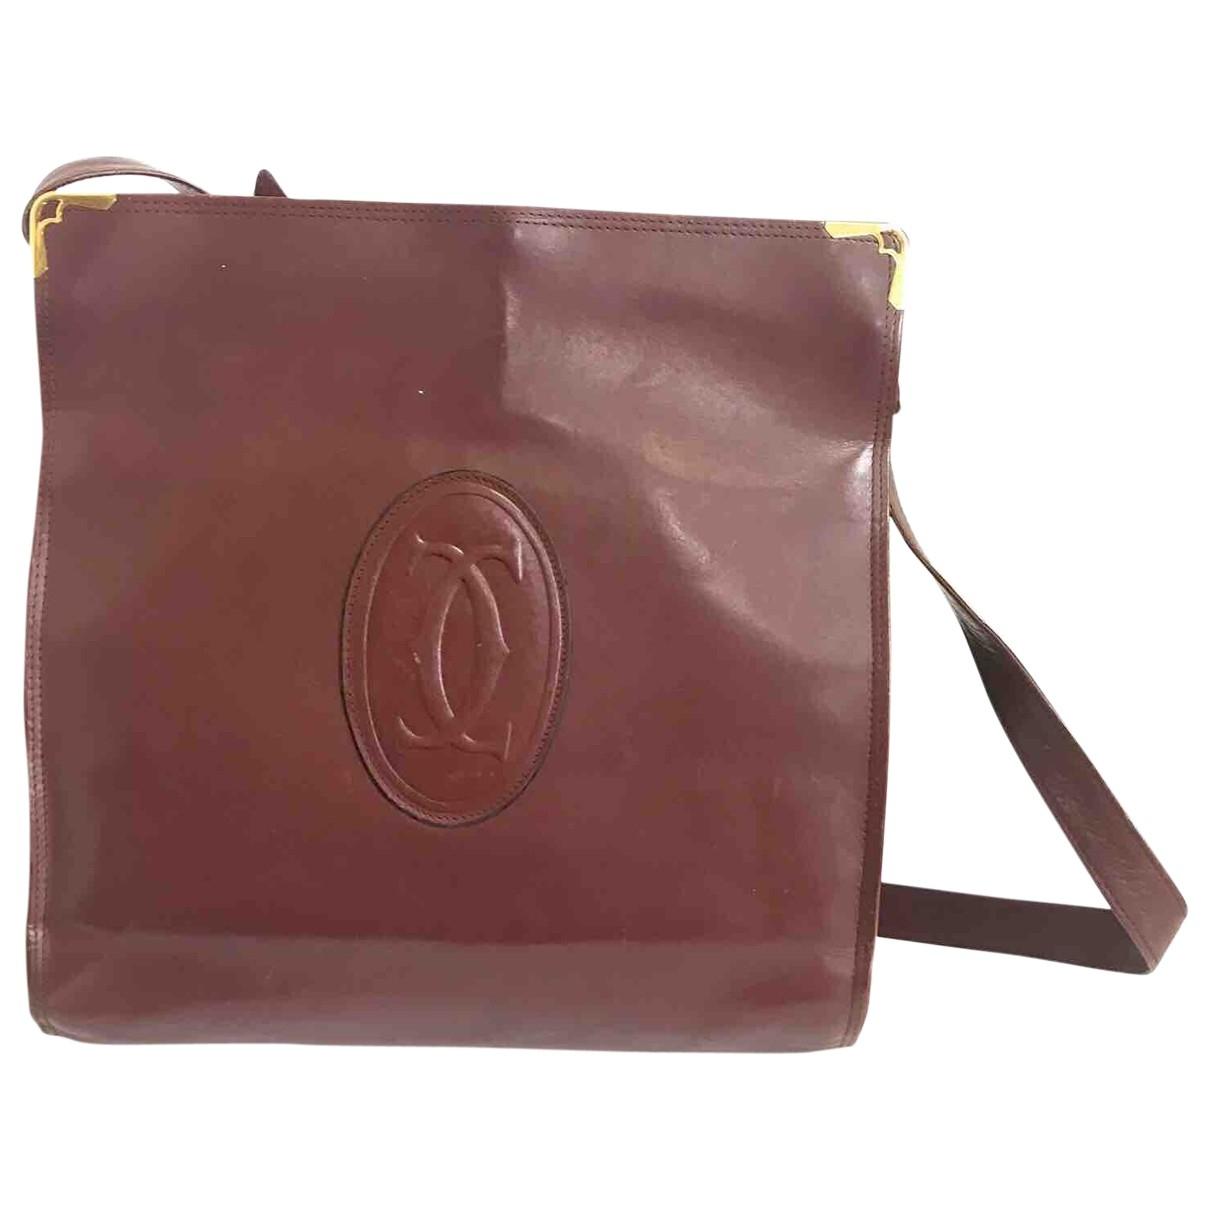 Cartier \N Burgundy Leather handbag for Women \N